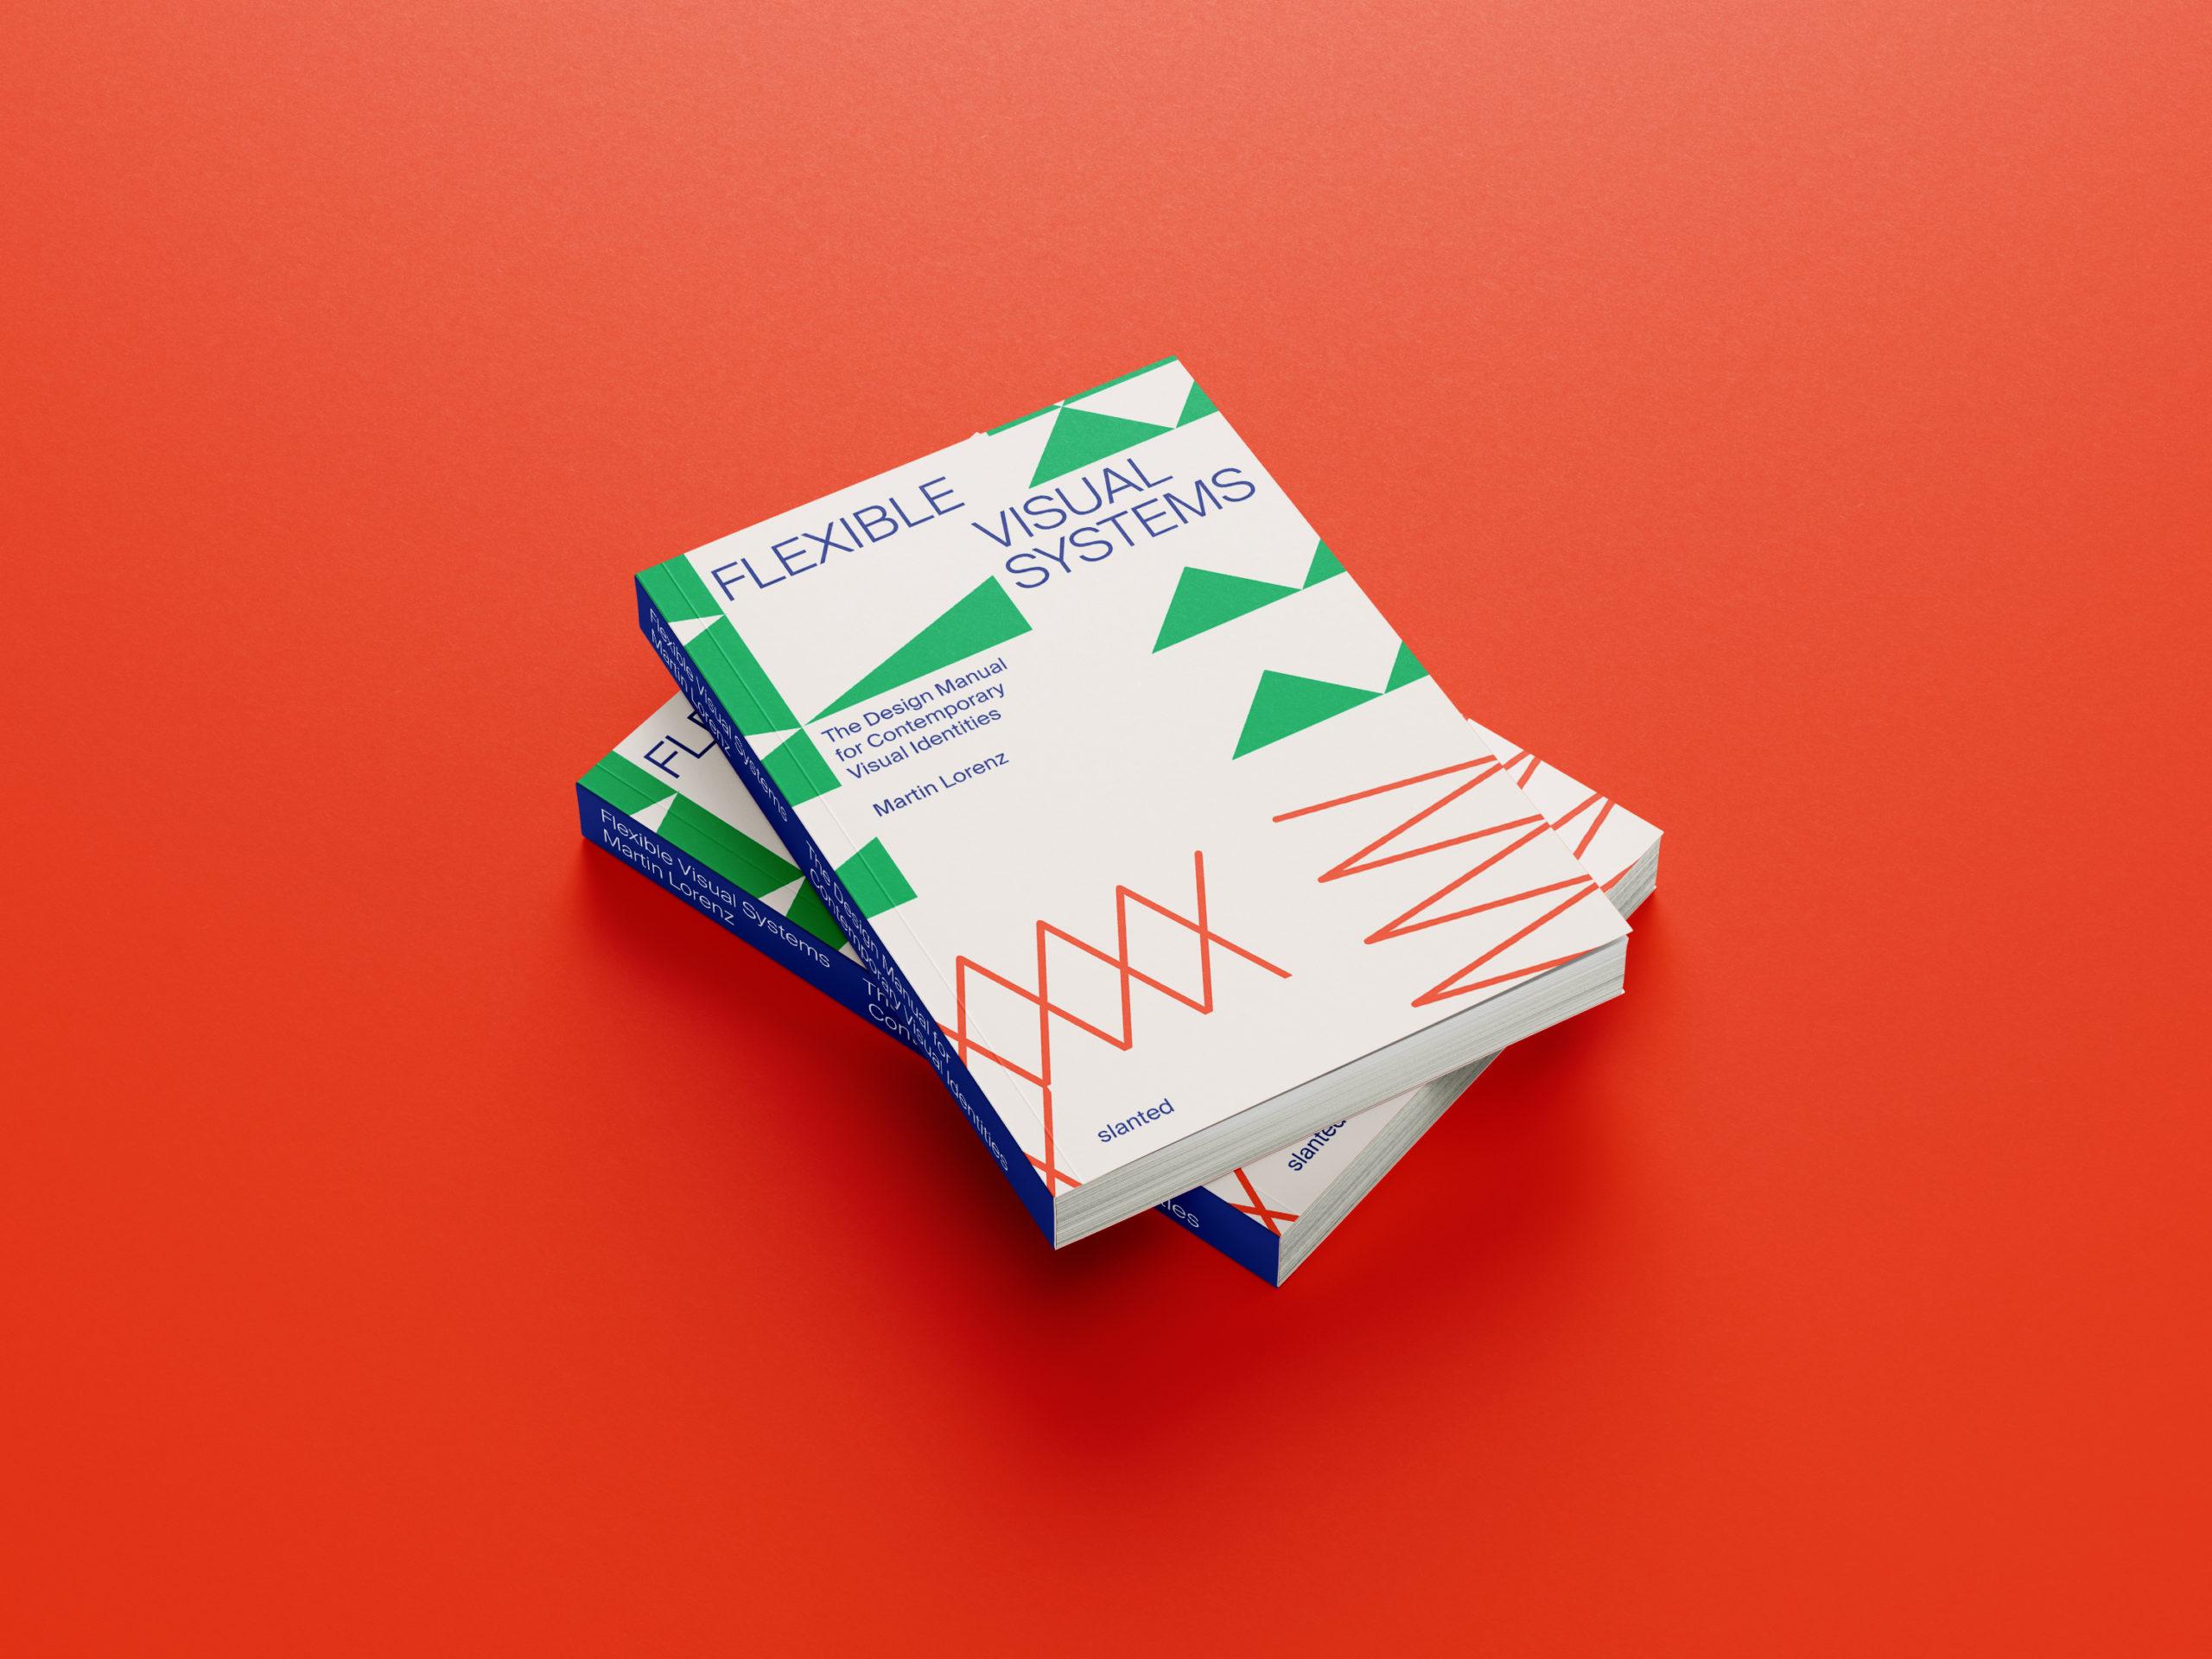 "Support ""Flexible Visual Systems"" on Kickstarter"